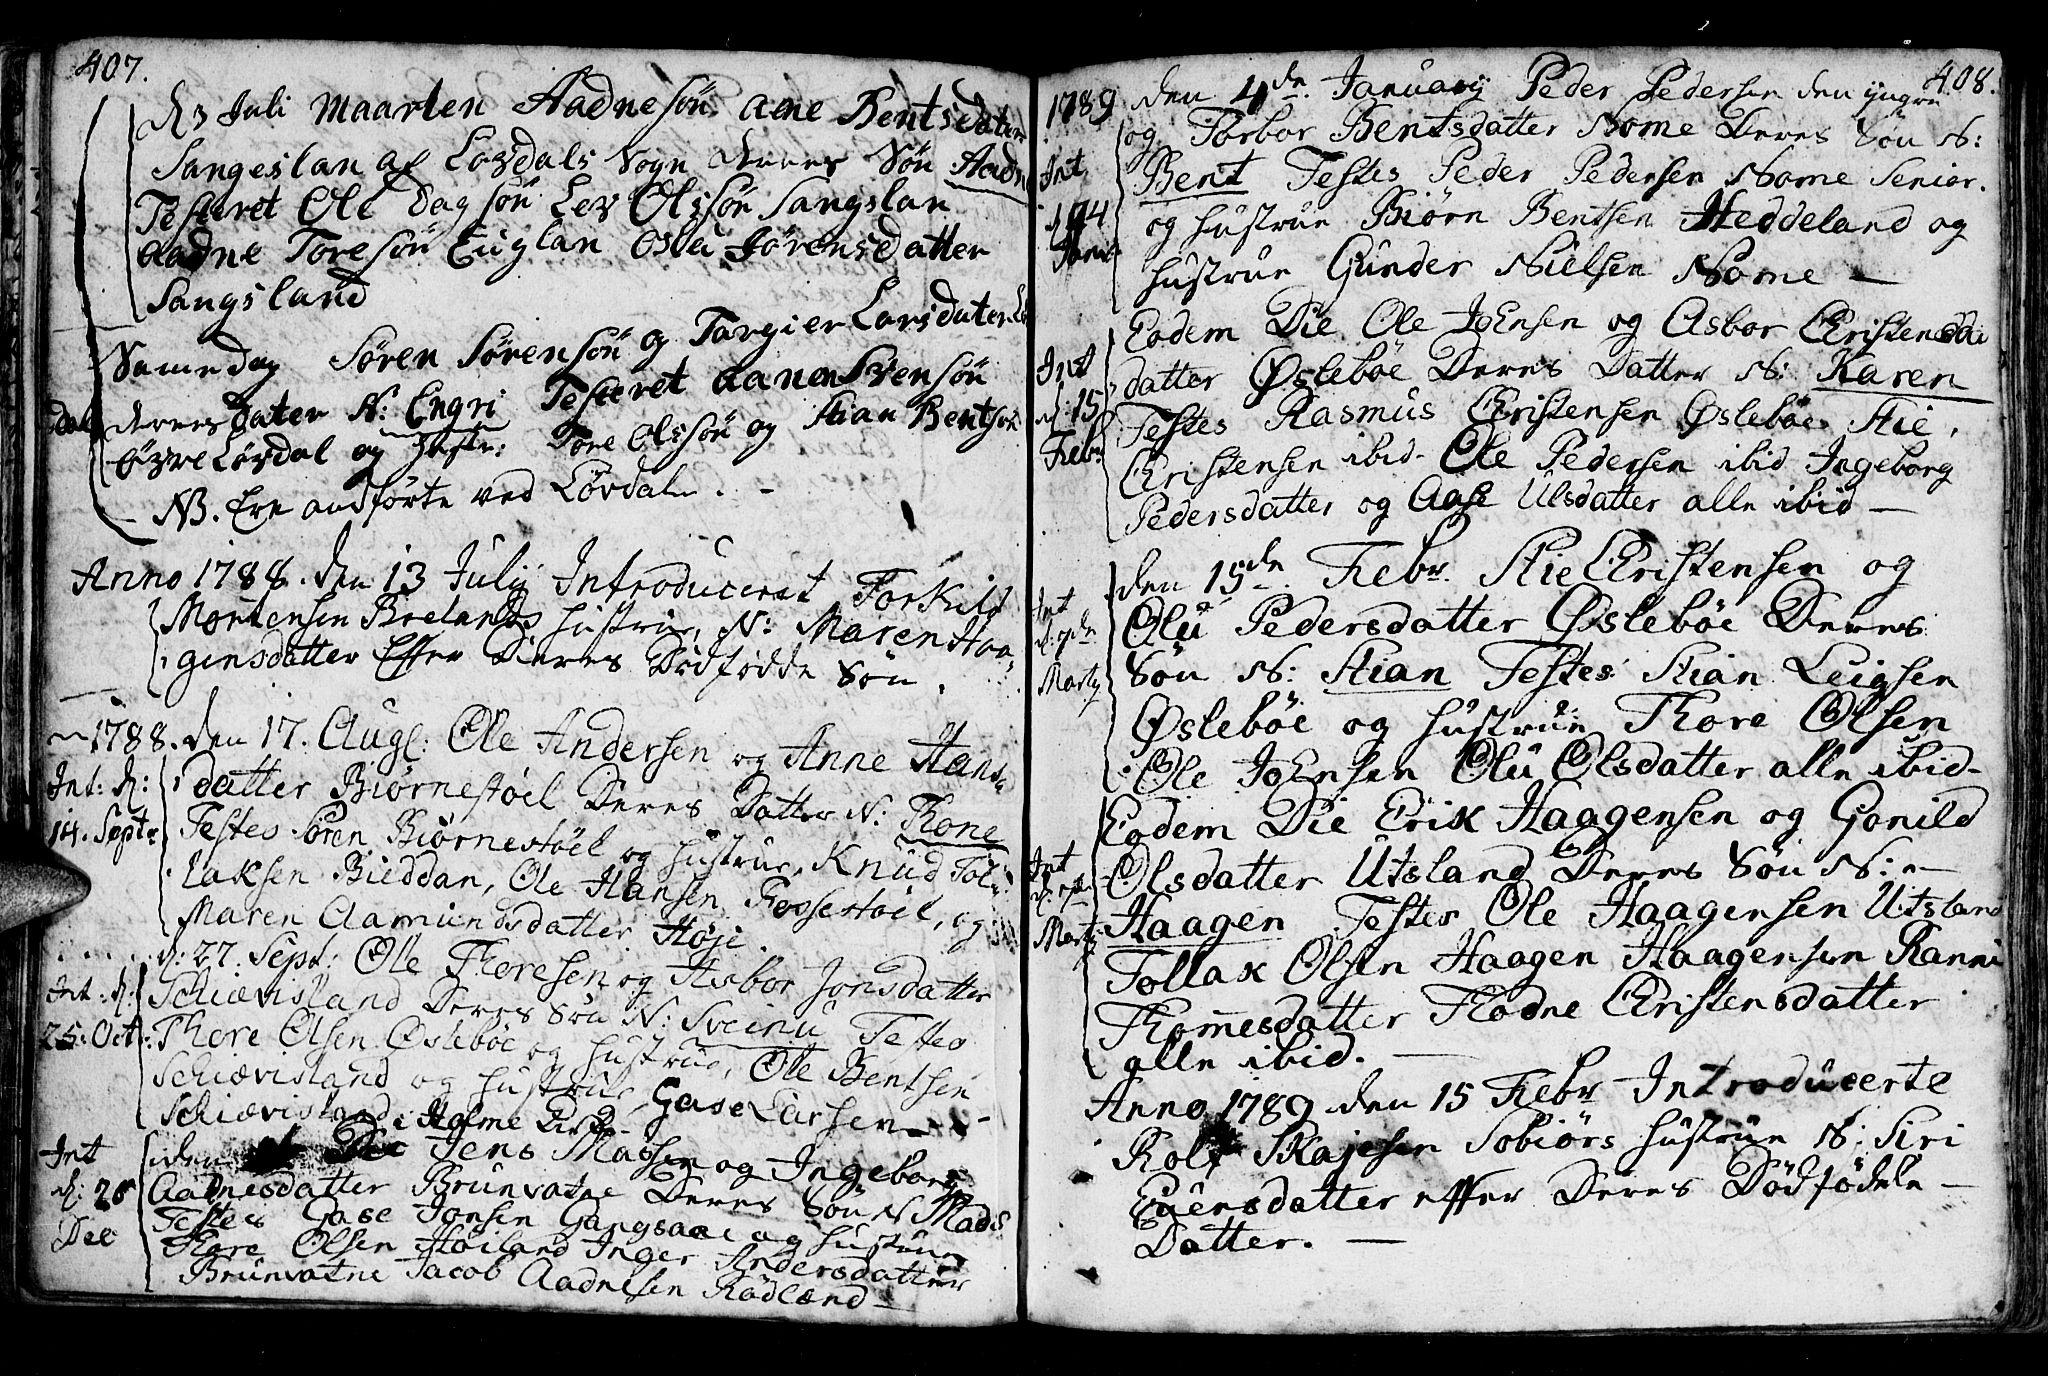 SAK, Holum sokneprestkontor, F/Fa/Fac/L0001: Ministerialbok nr. A 1, 1773-1820, s. 407-408